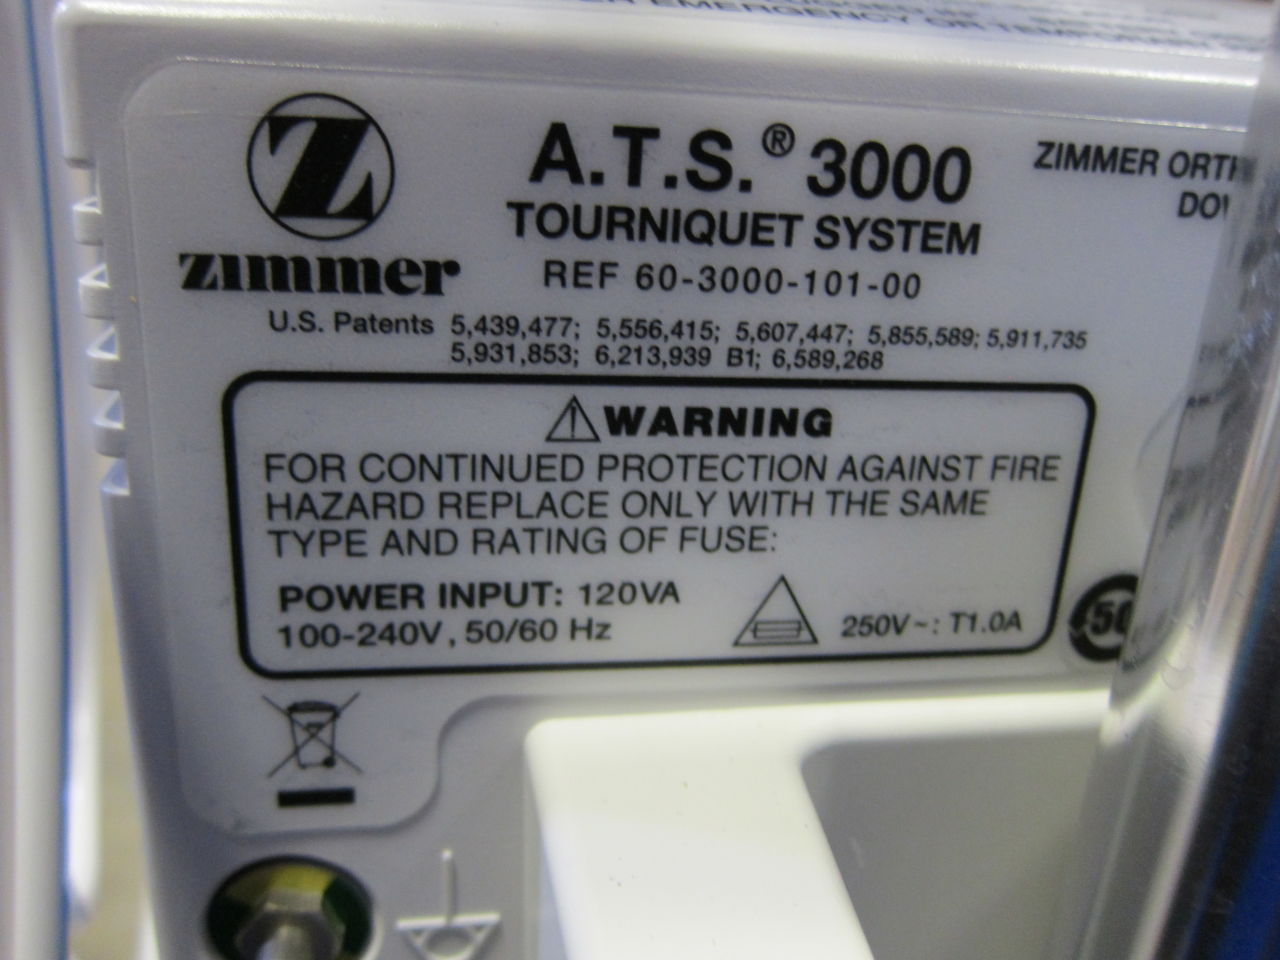 ZIMMER Various Tourniquet System